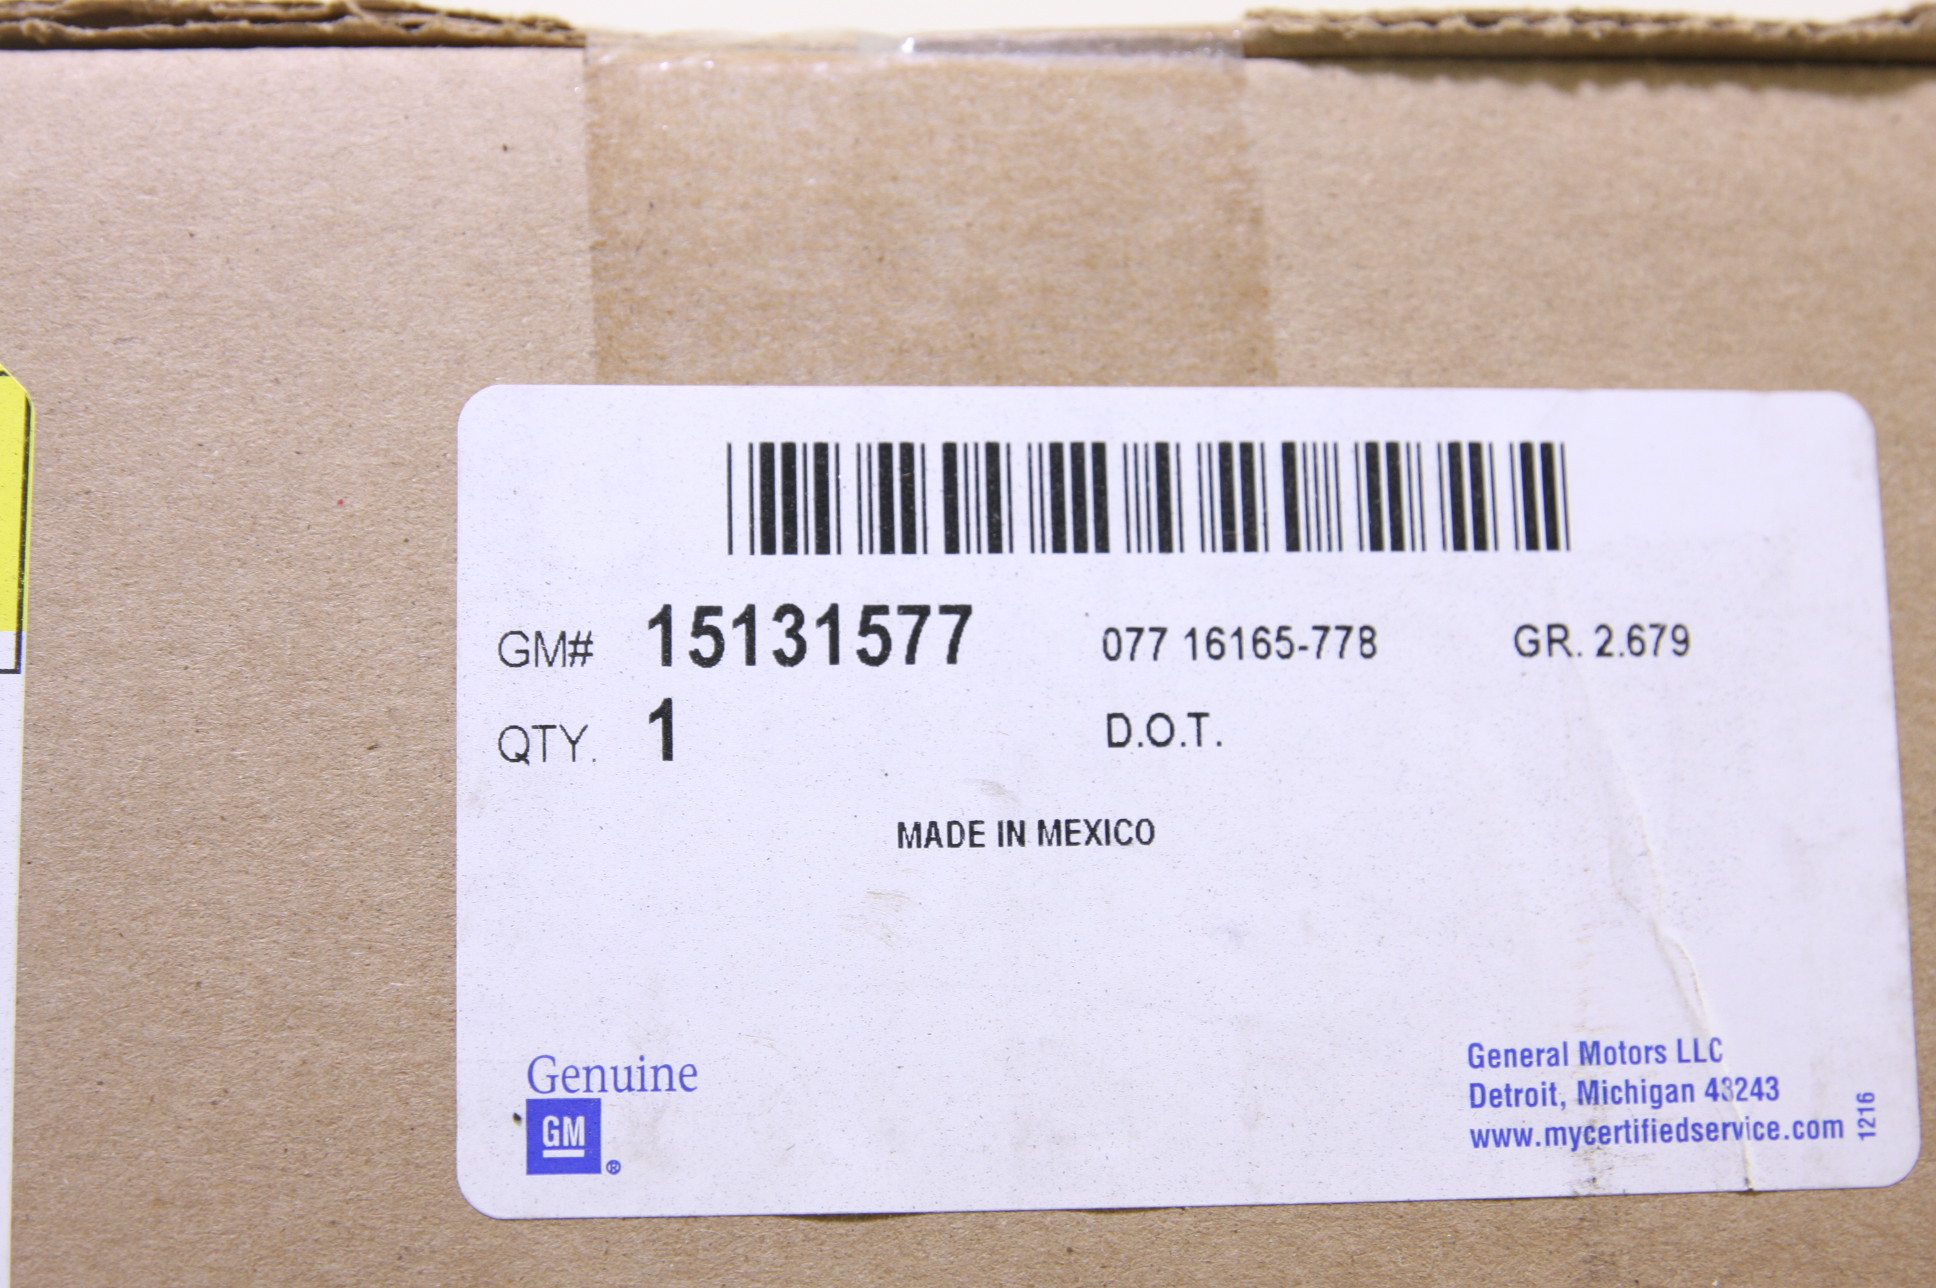 *New OEM GM 15131577 GMC Envoy 02-09 Right Rear Brake Taillight Taillamp Lens - image 6